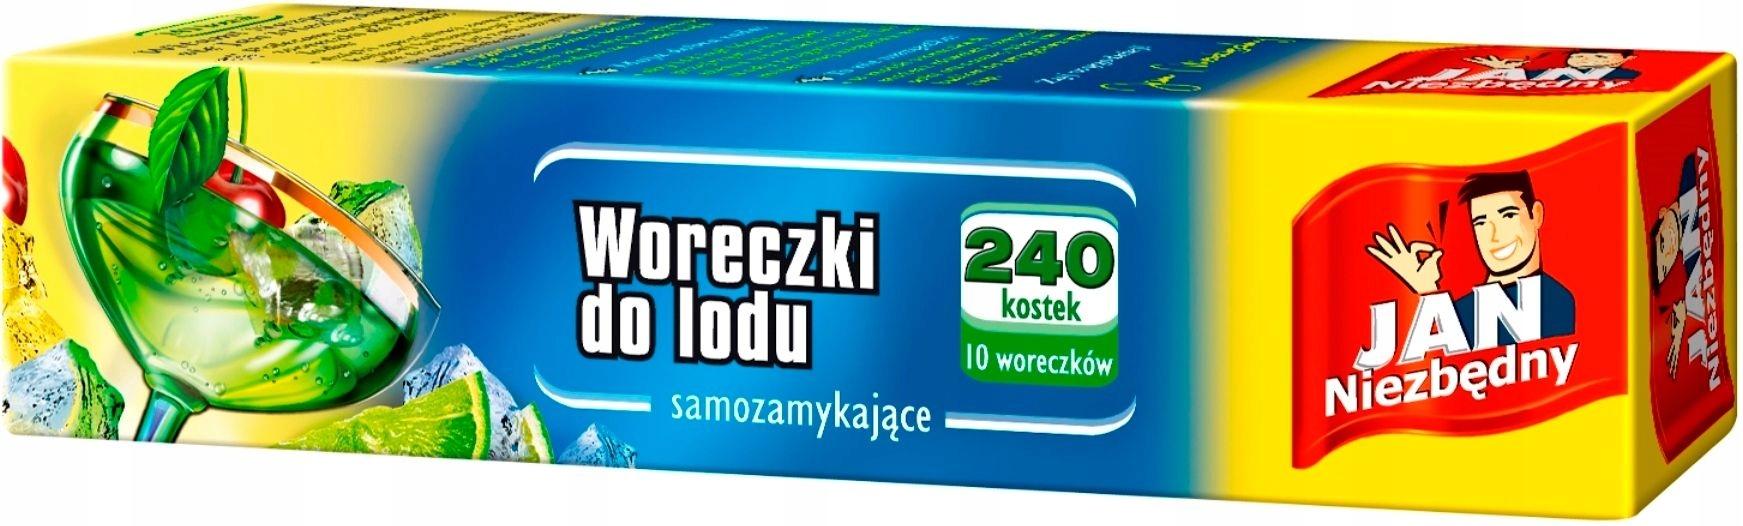 СУМКИ JAN НЕОБХОДИМЫЕ СУМКИ ДЛЯ ЛЕДЯНЫХ КУБОКОВ 240